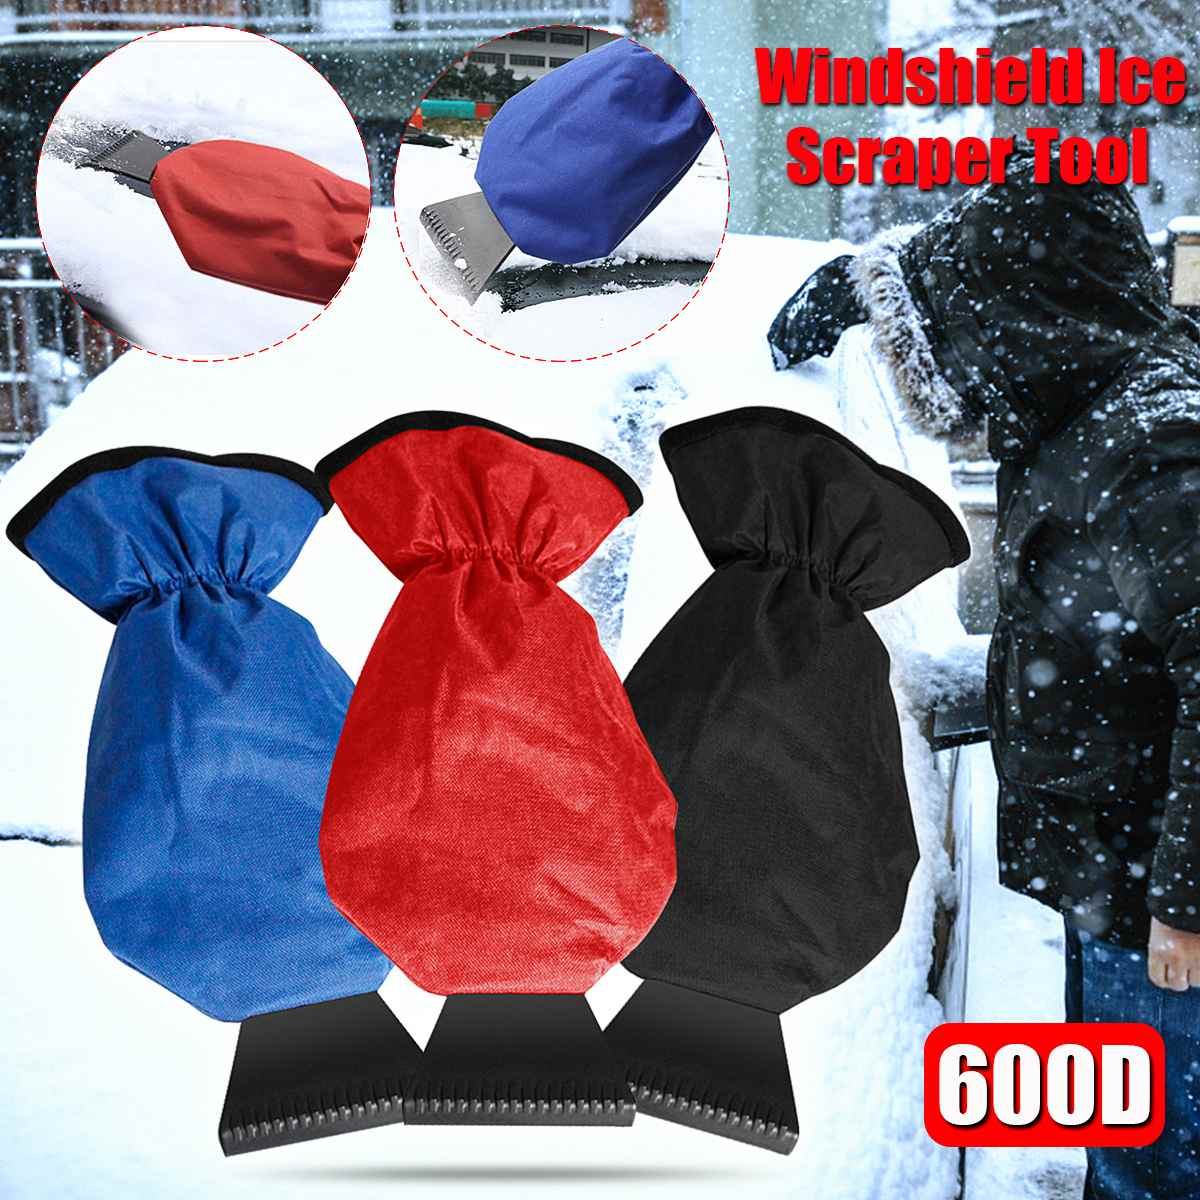 Car Ice Snow Gloves Scraper Waterproof Windshield Glass Snow Shovel Glove Tool Keep Warm Oxford Cloth Snow Removal